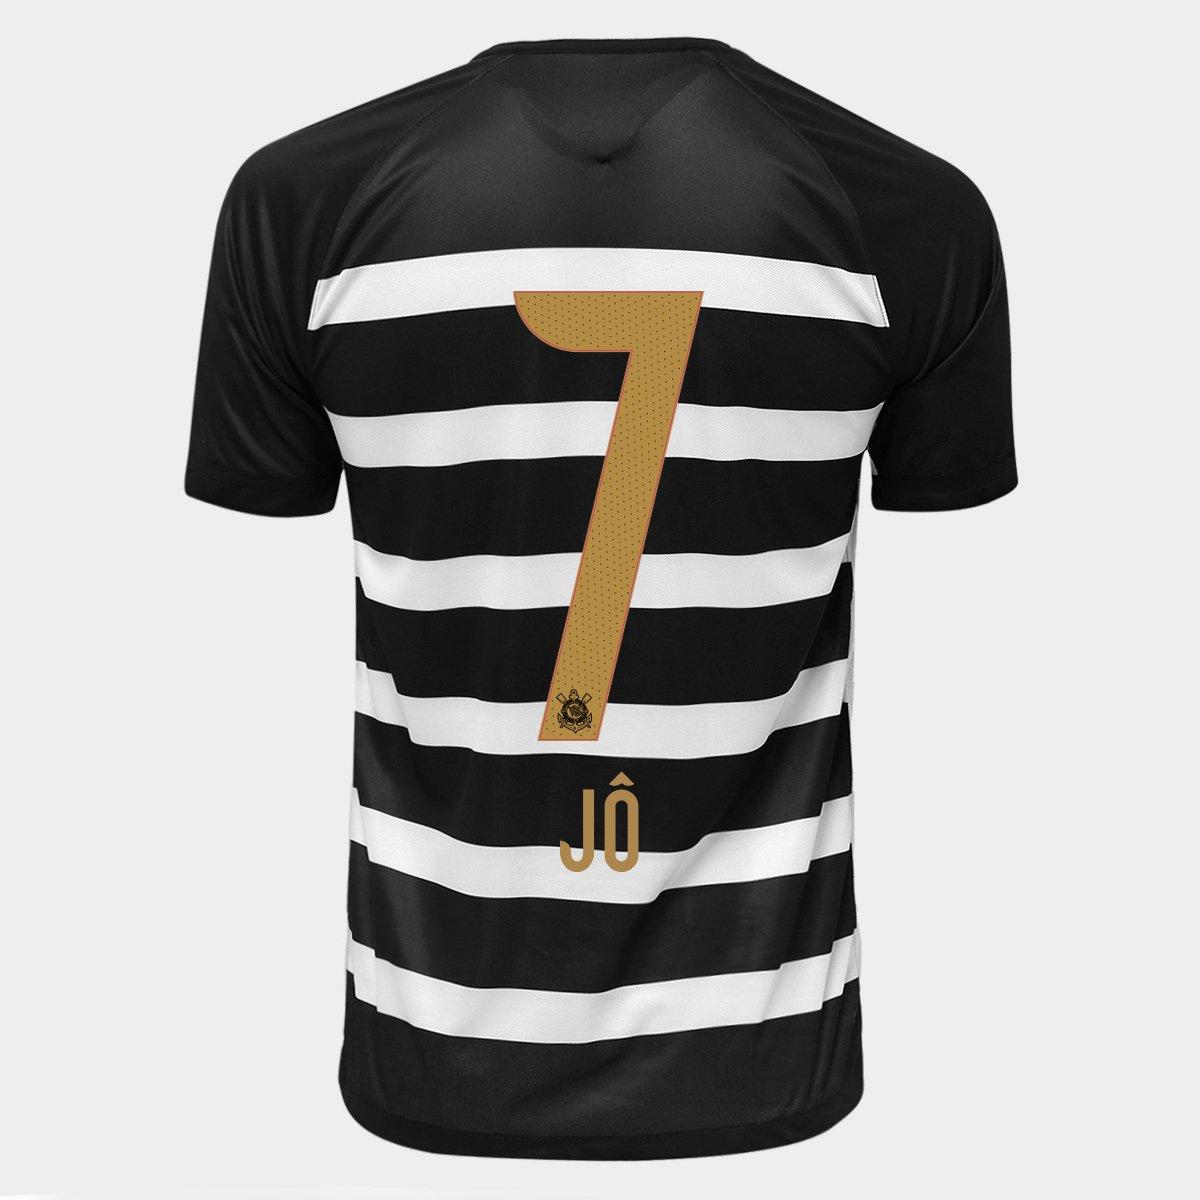 Camisa Nike Corinthians II 15 16 nº 7 - Jô - Compre Agora  52d919fa0faec